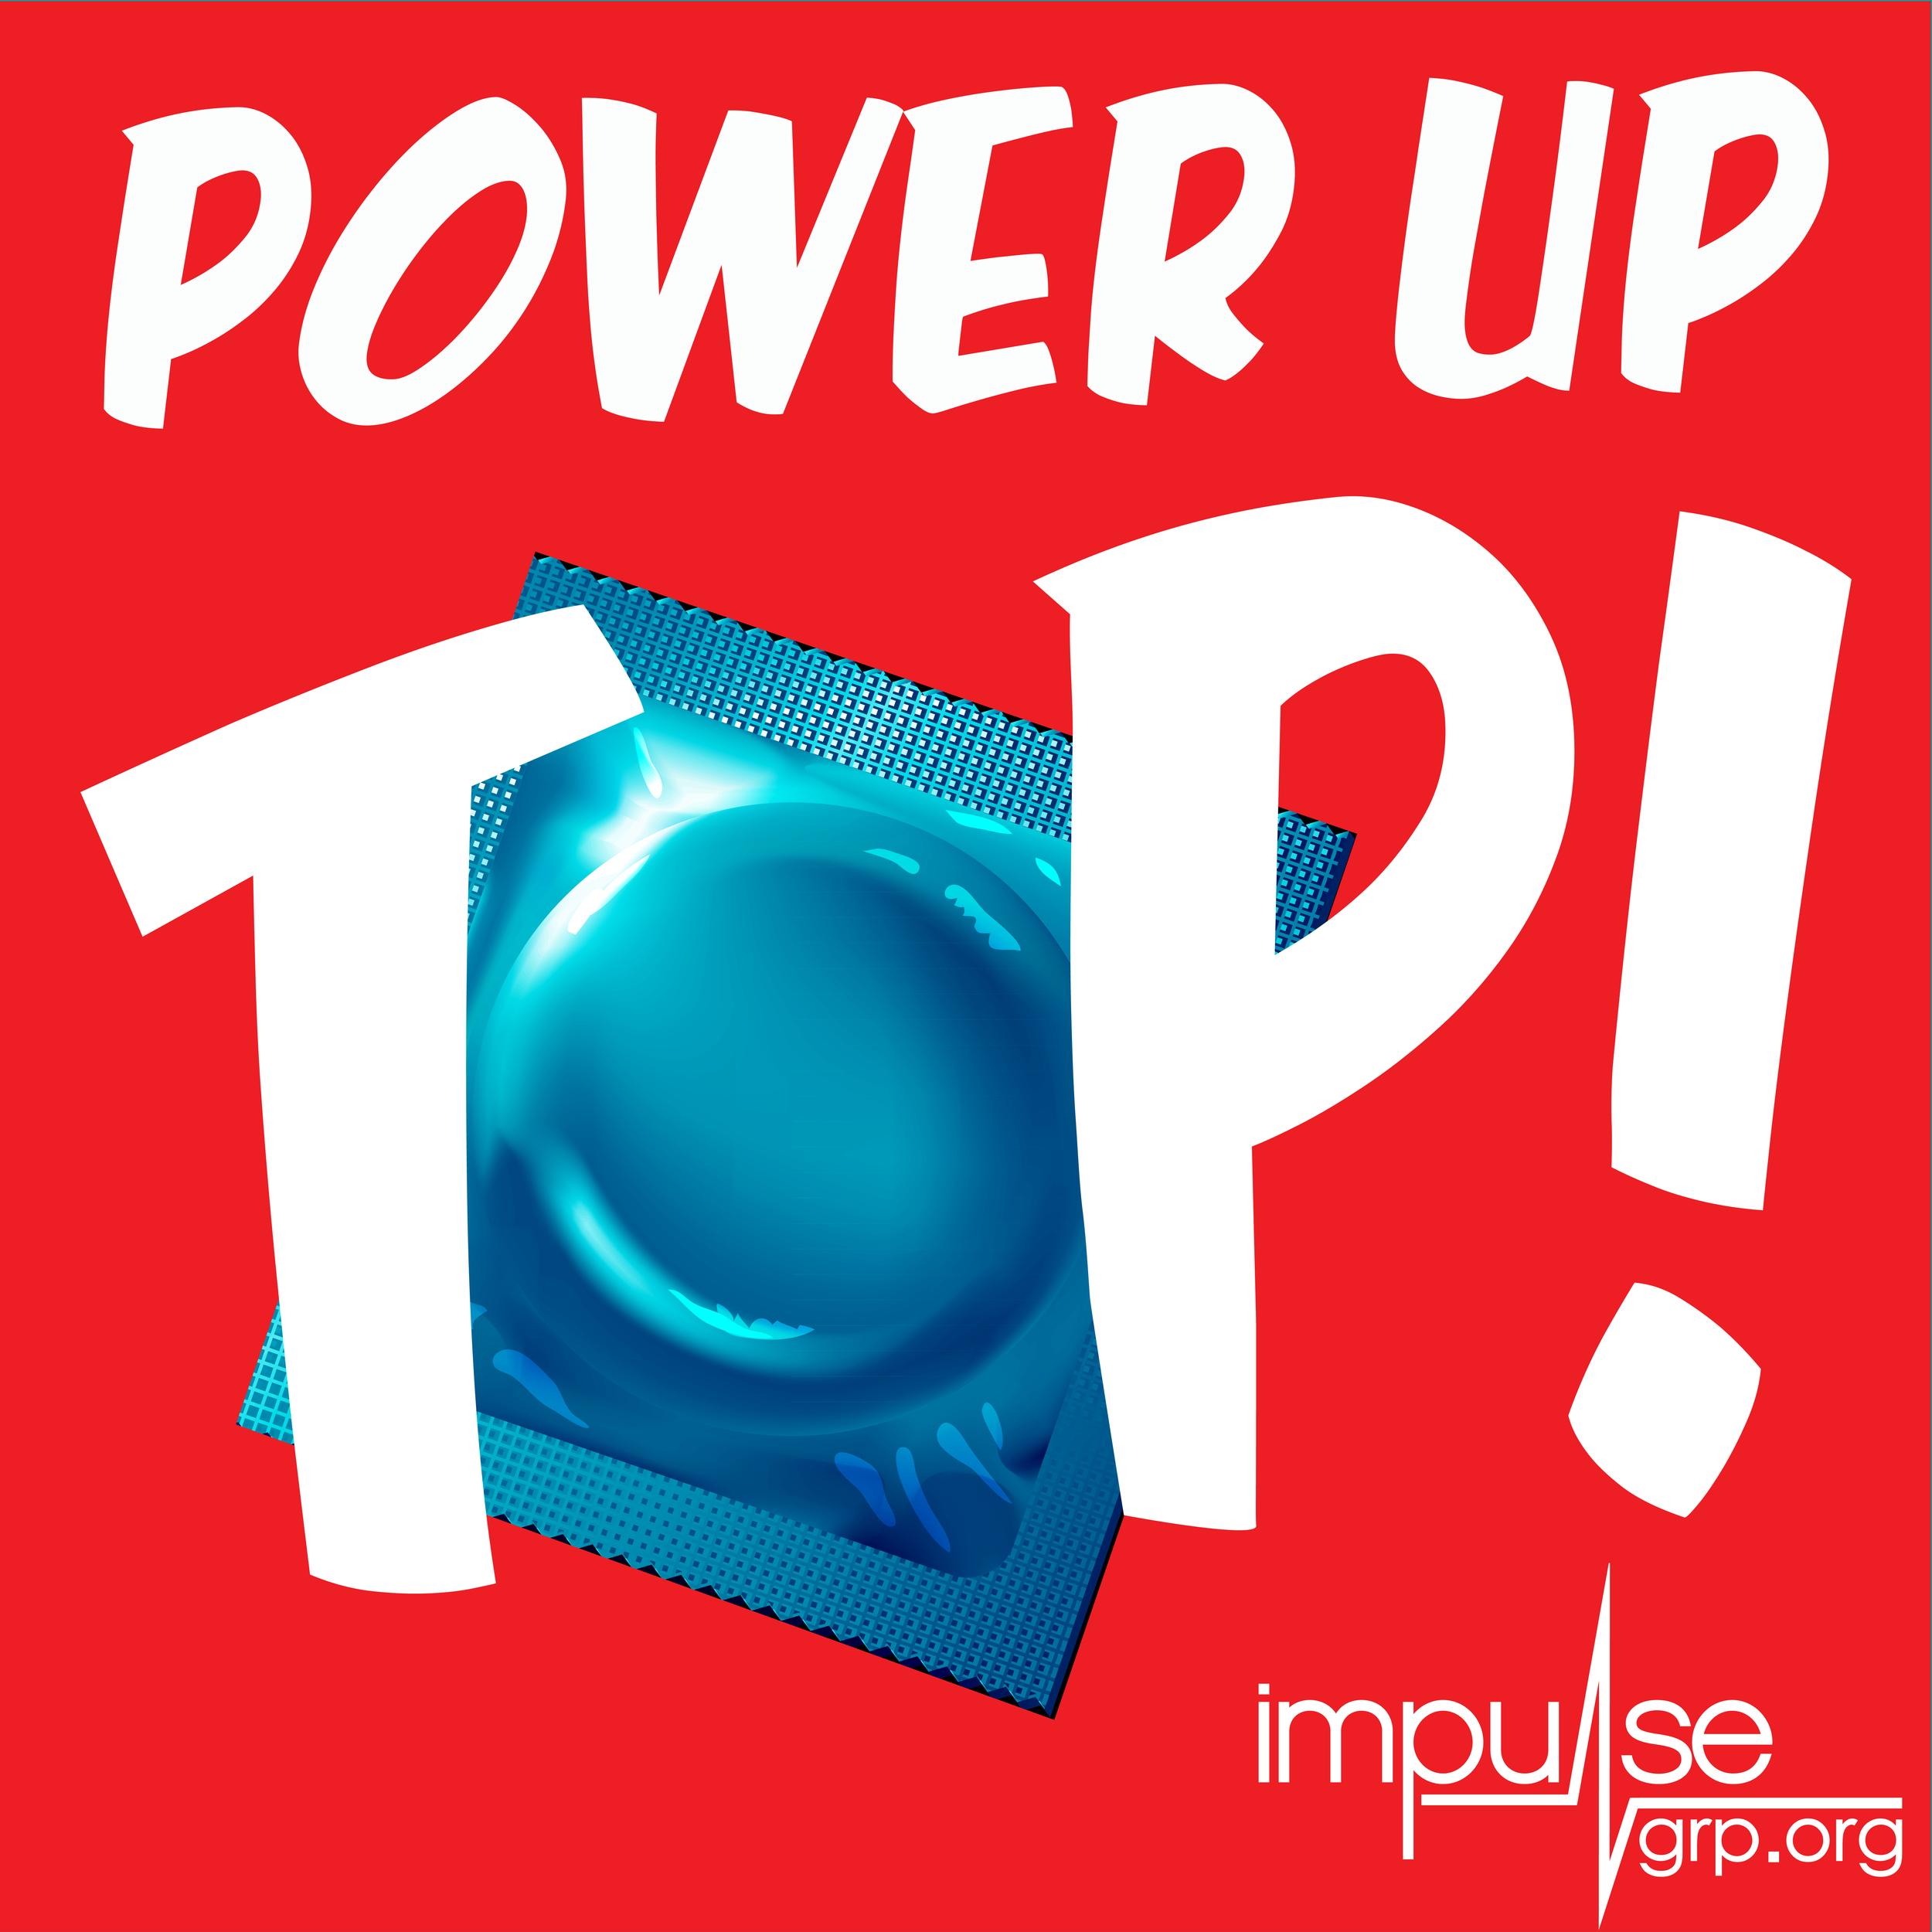 POWER UP Guerrilla  Top.jpg